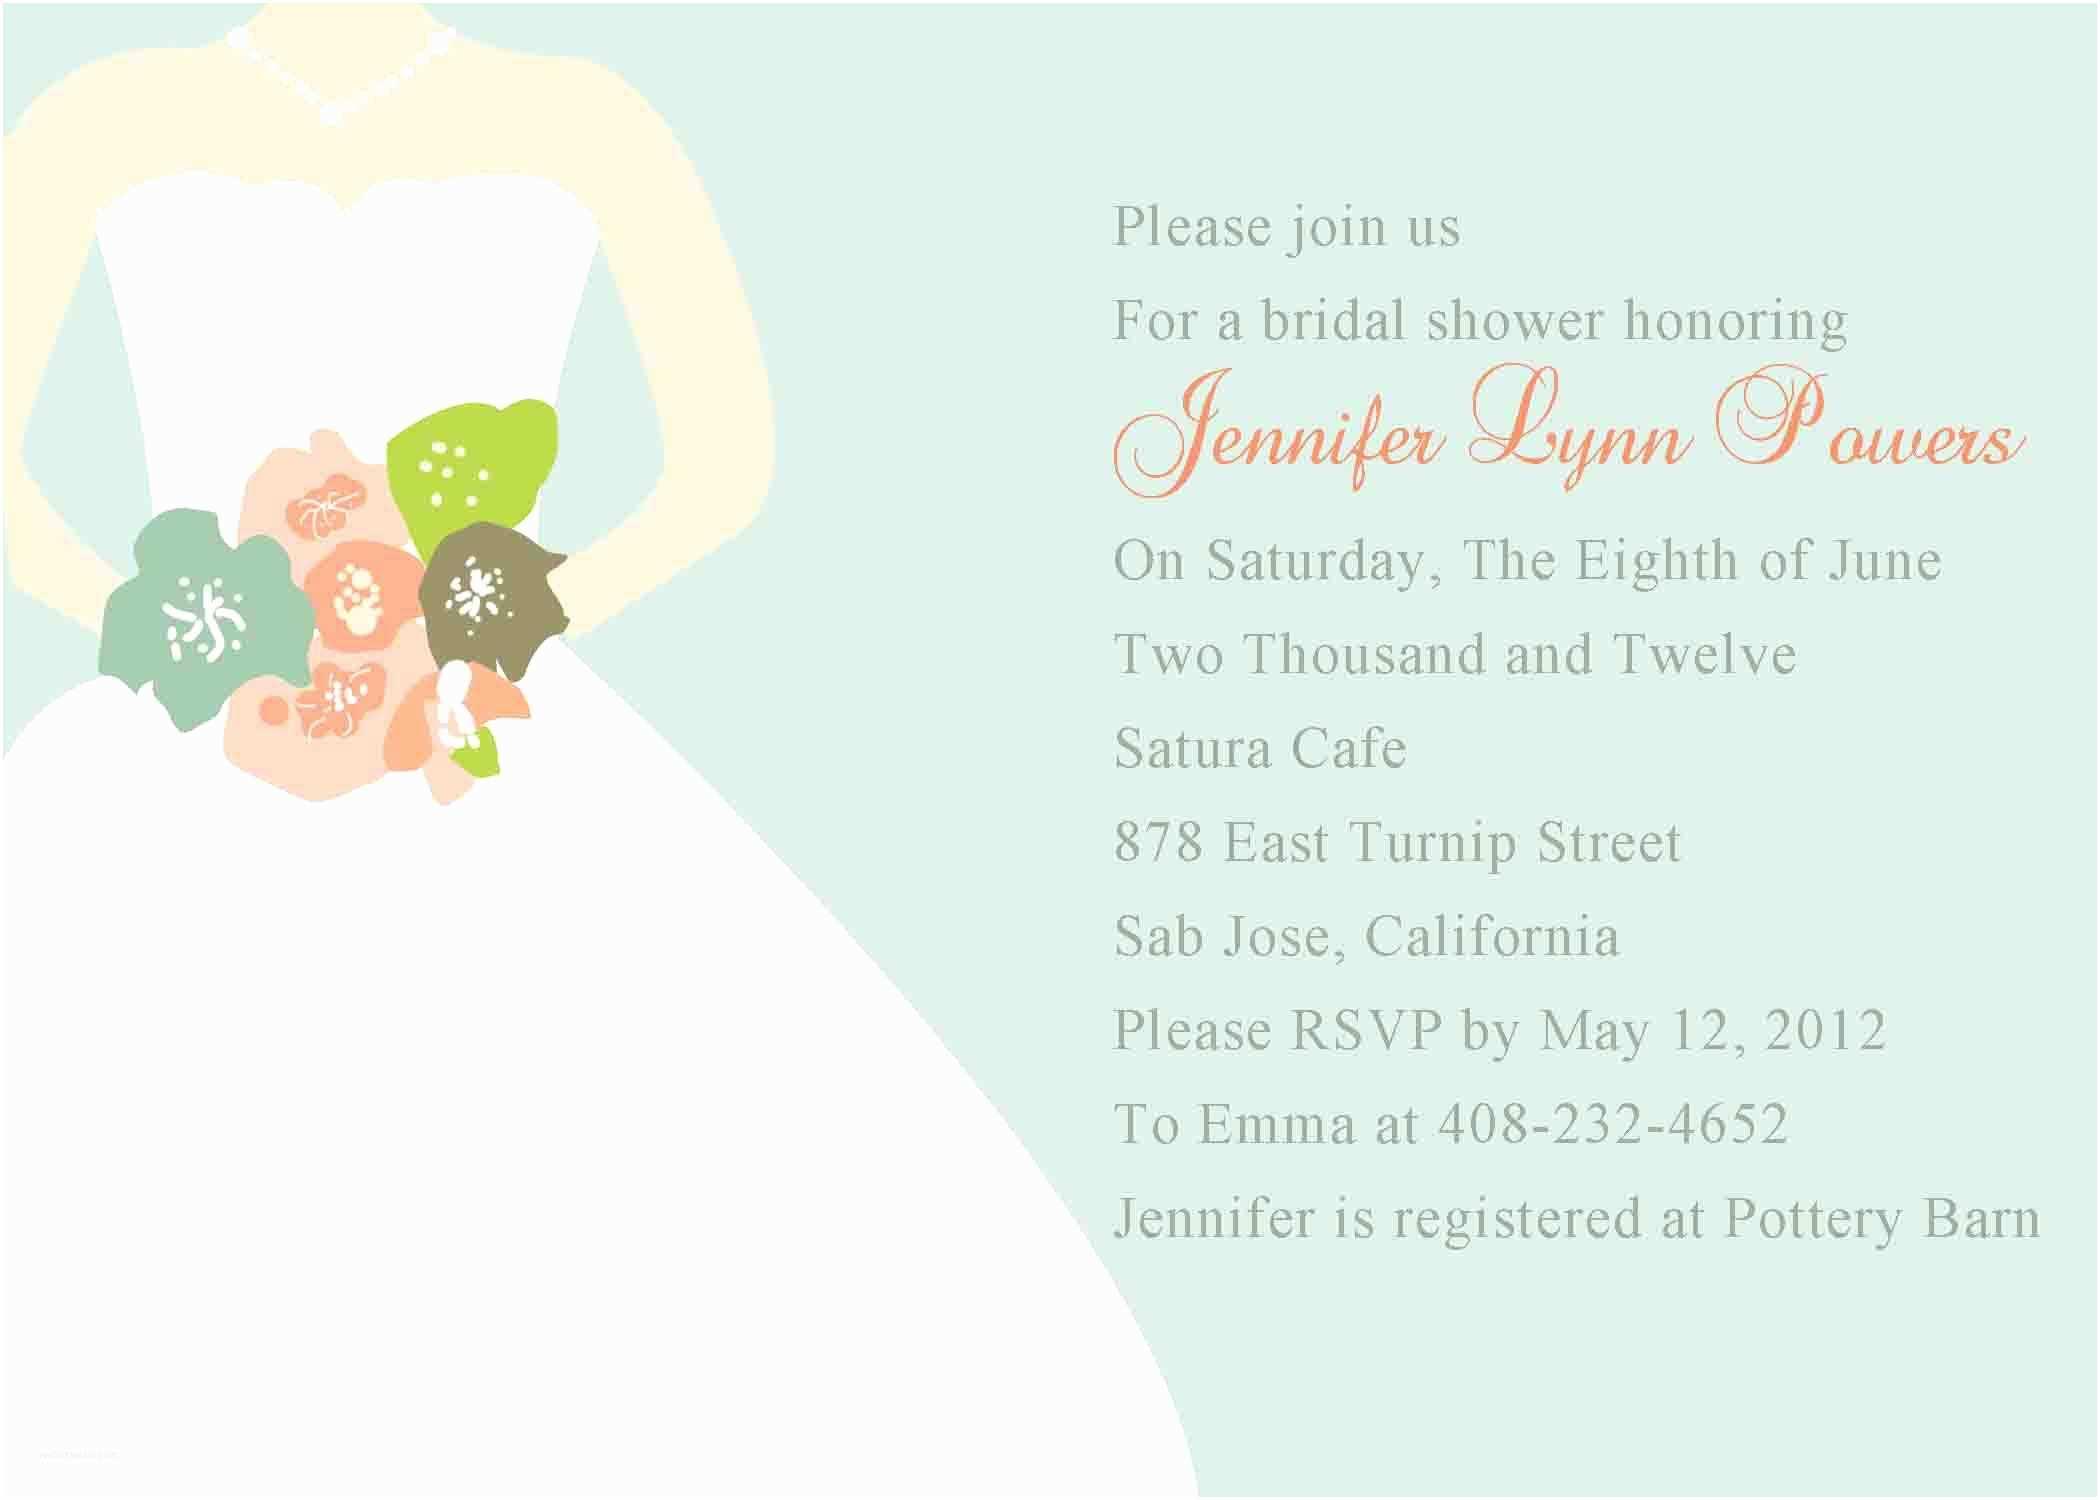 Beach theme Bridal Shower Invitations Wedding Shower Invitations Wedding Shower Invitations